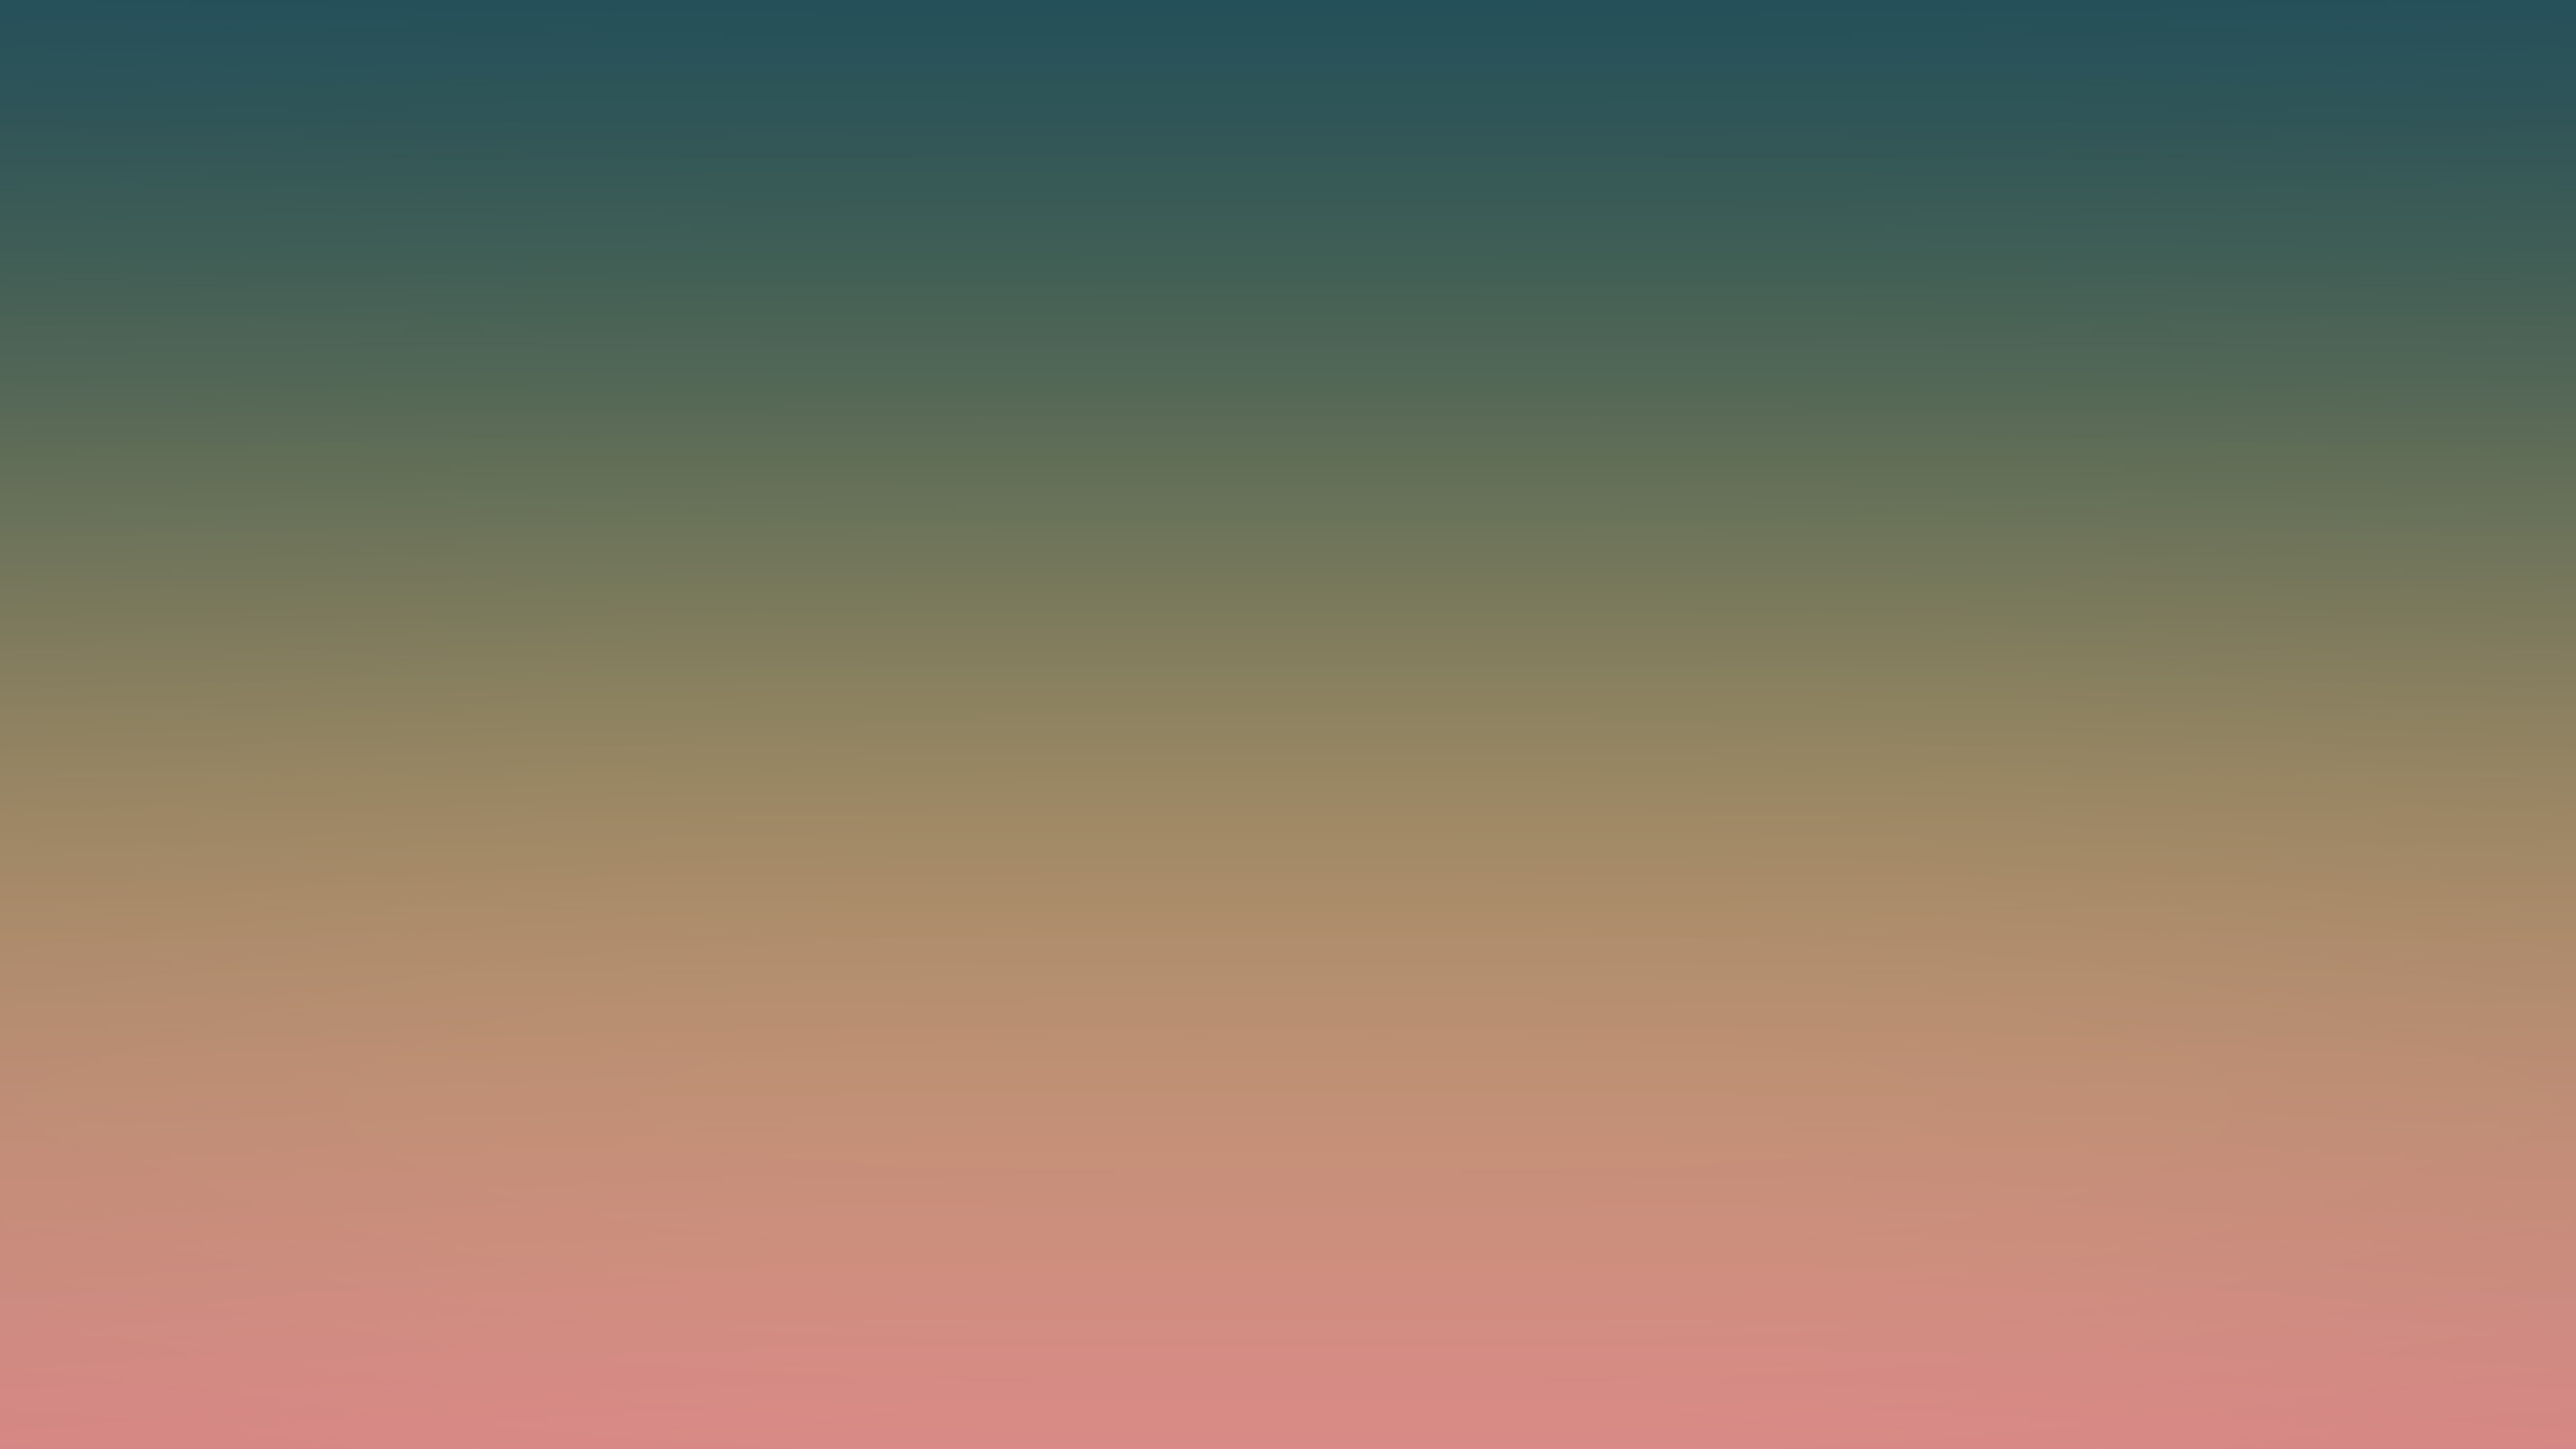 Sj43 ugly people color gradation blur wallpaper - Color gradation wallpaper ...